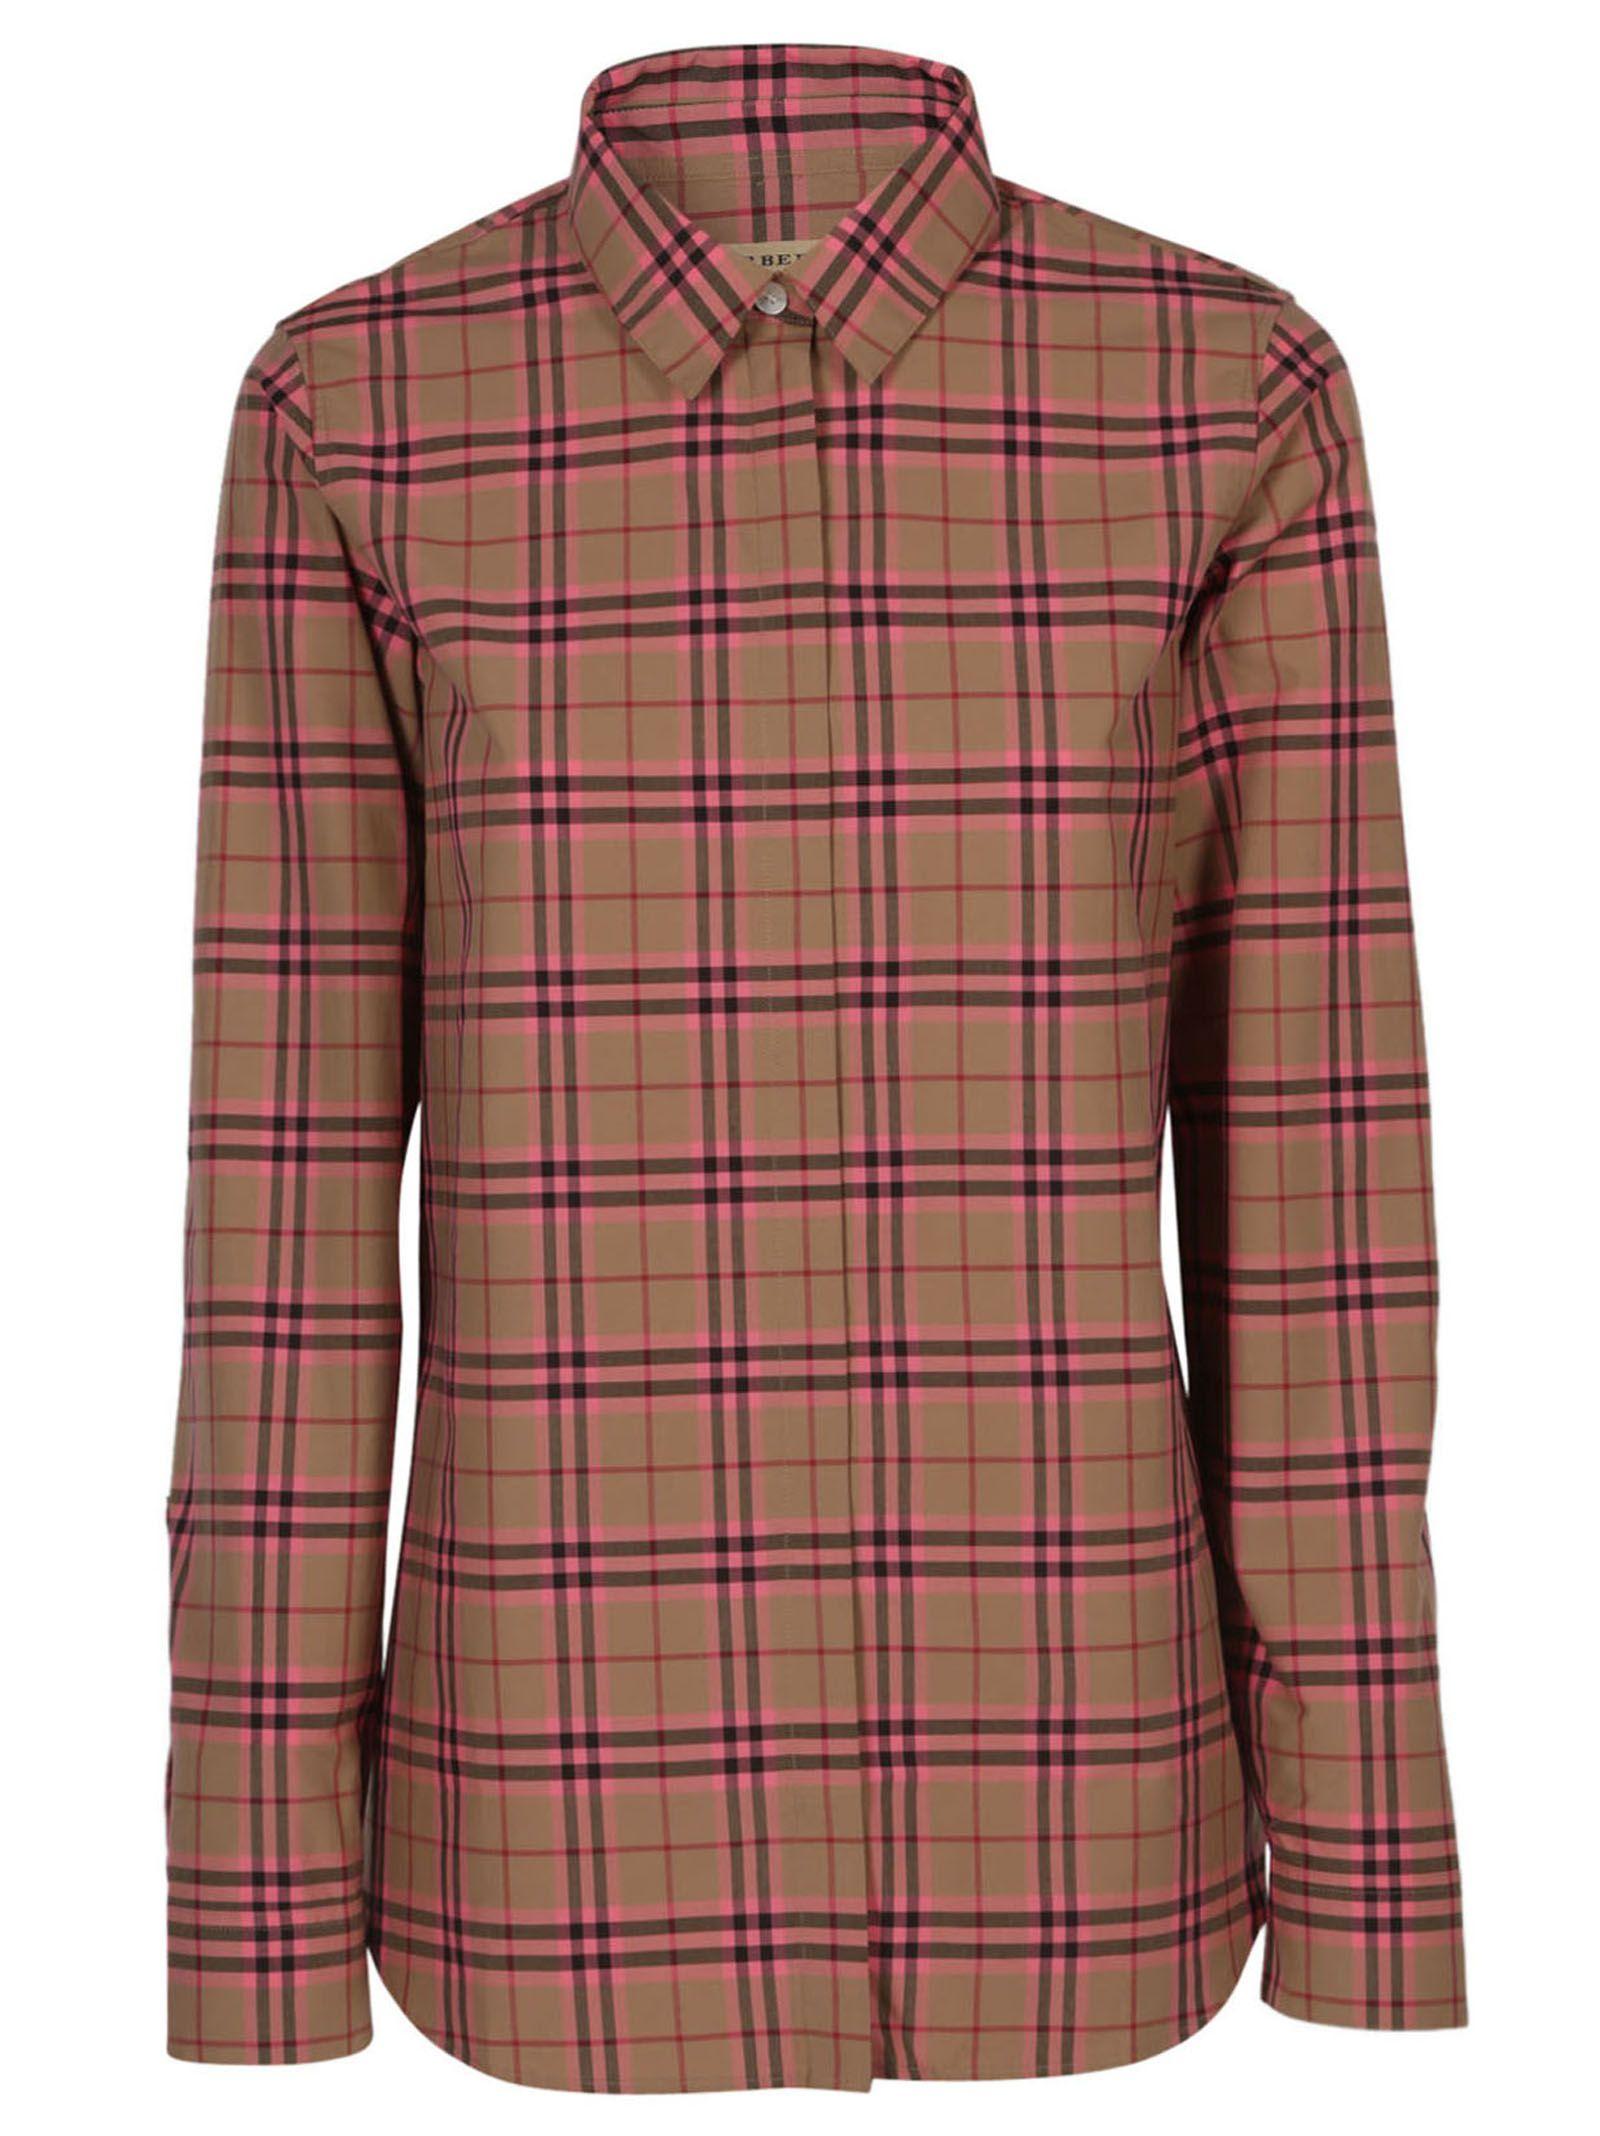 Burberry Basic Shirt